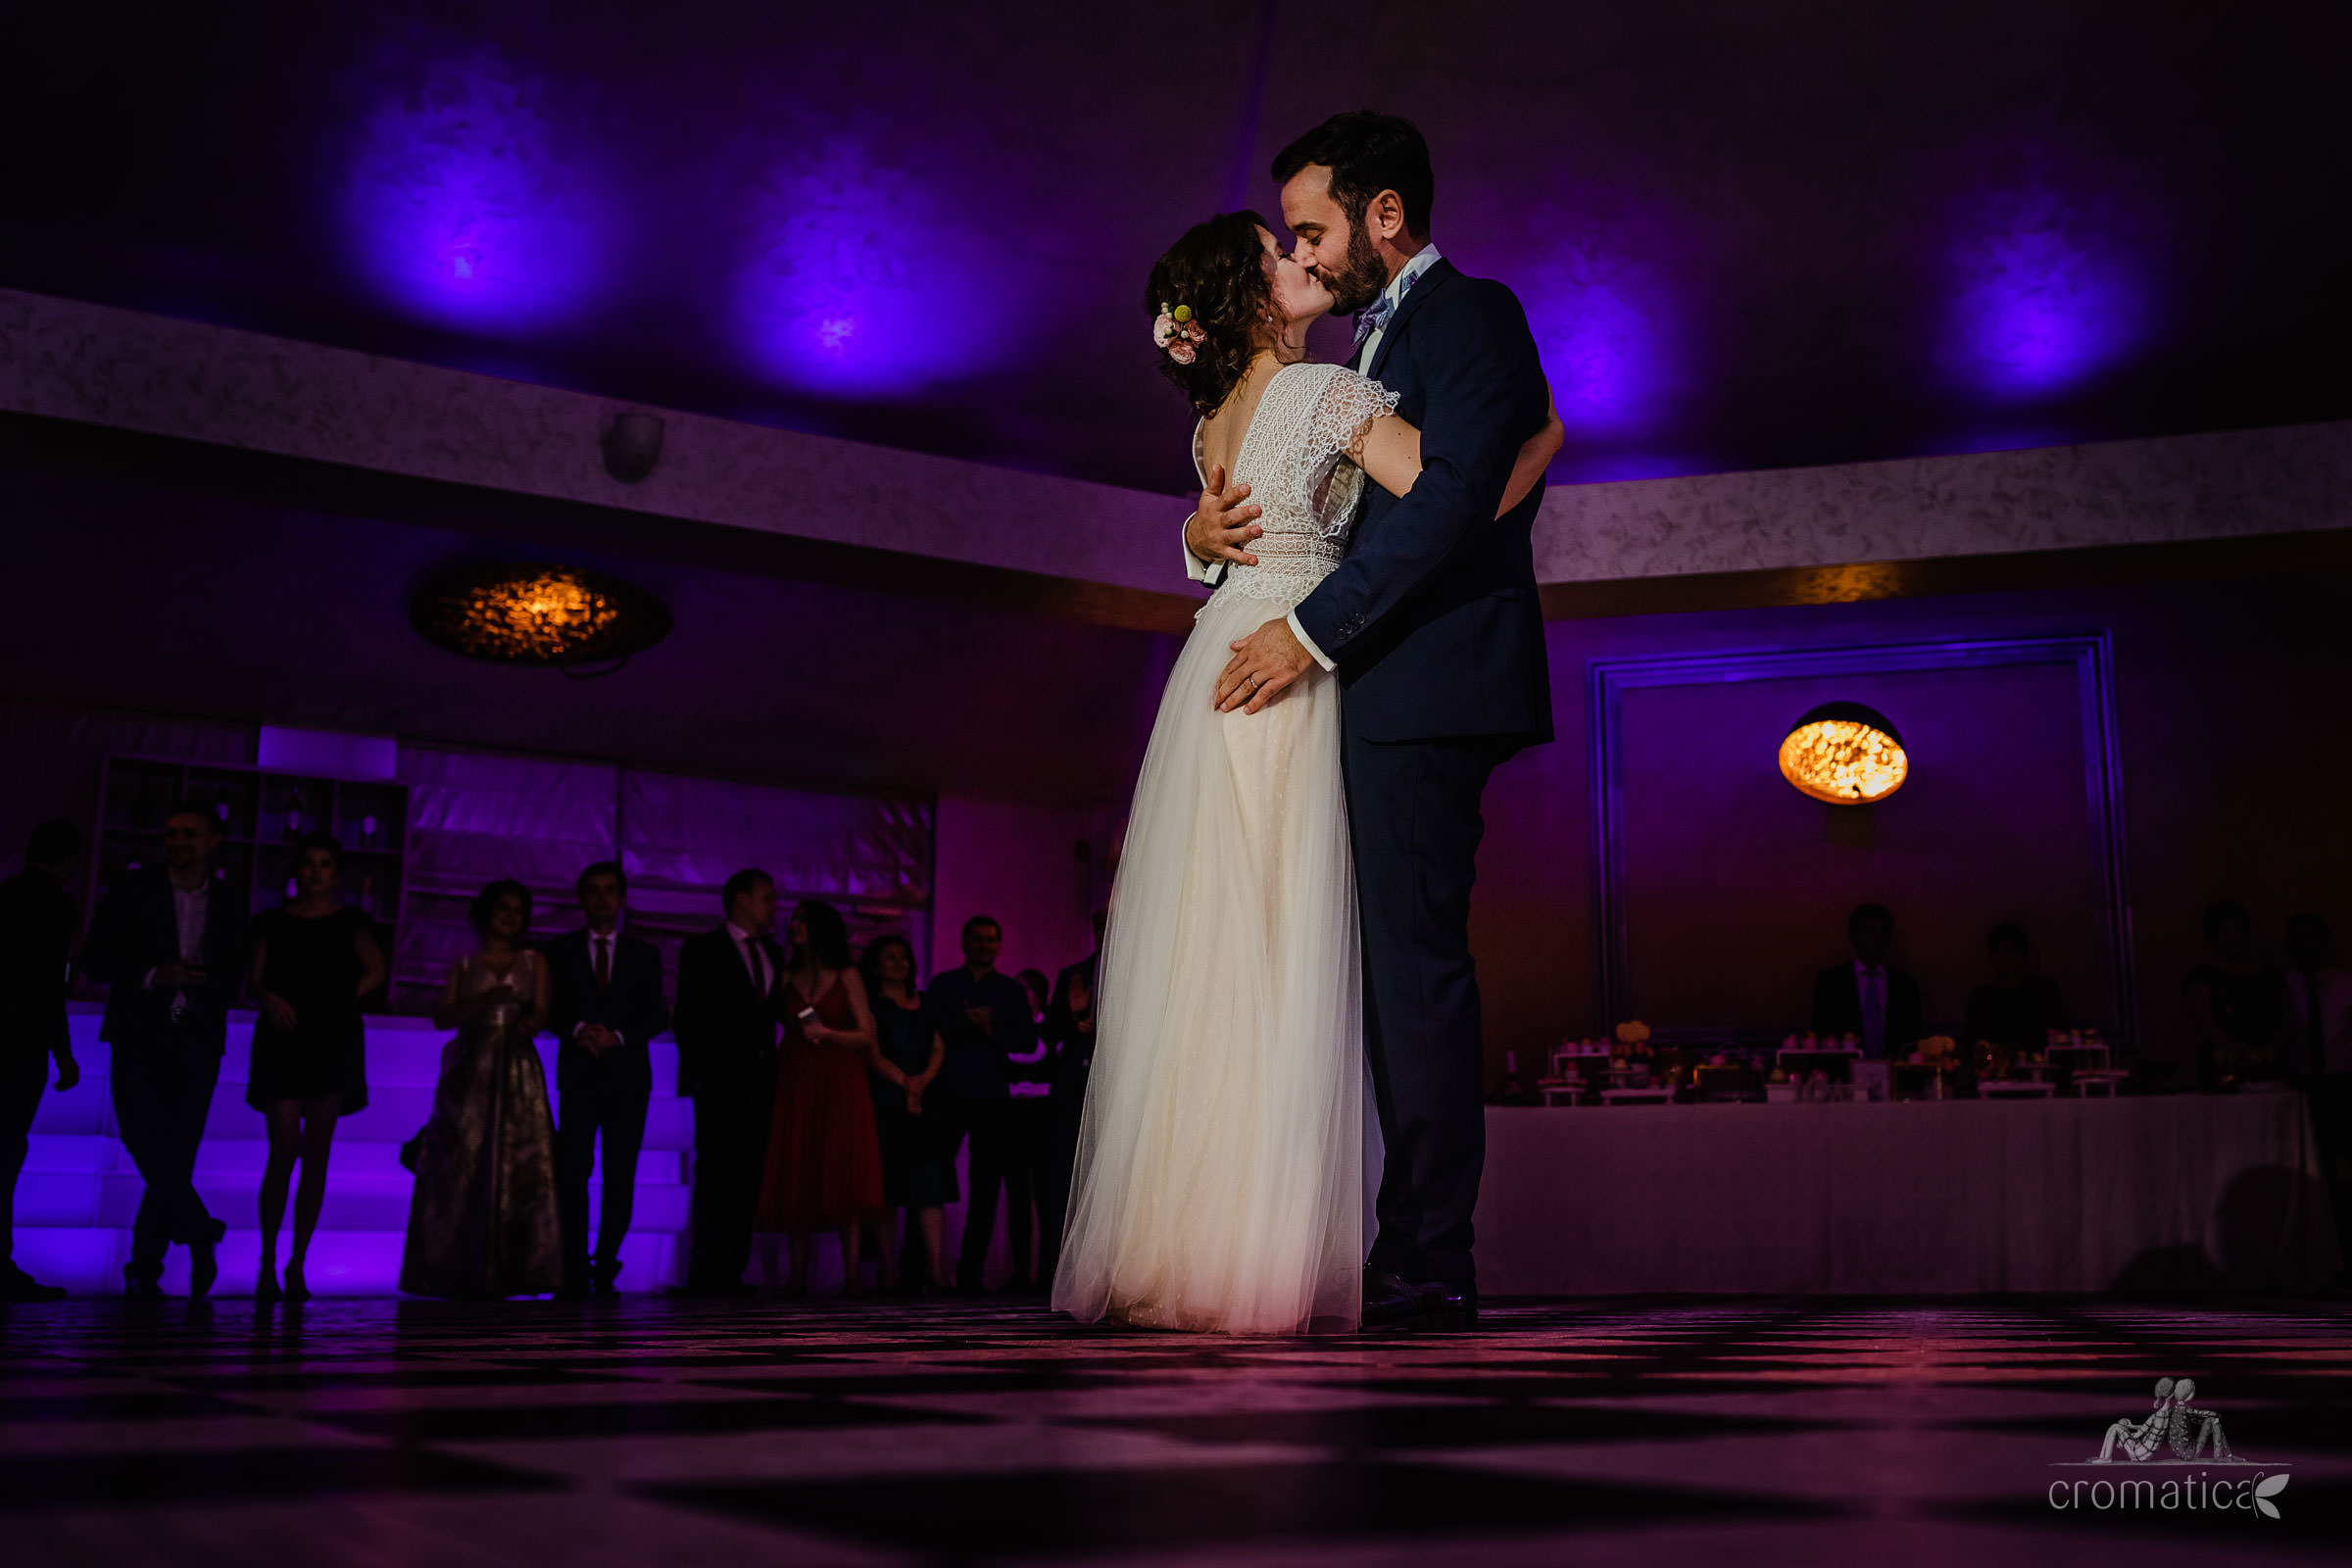 roxana mihai fotografii nunta la seratta 062